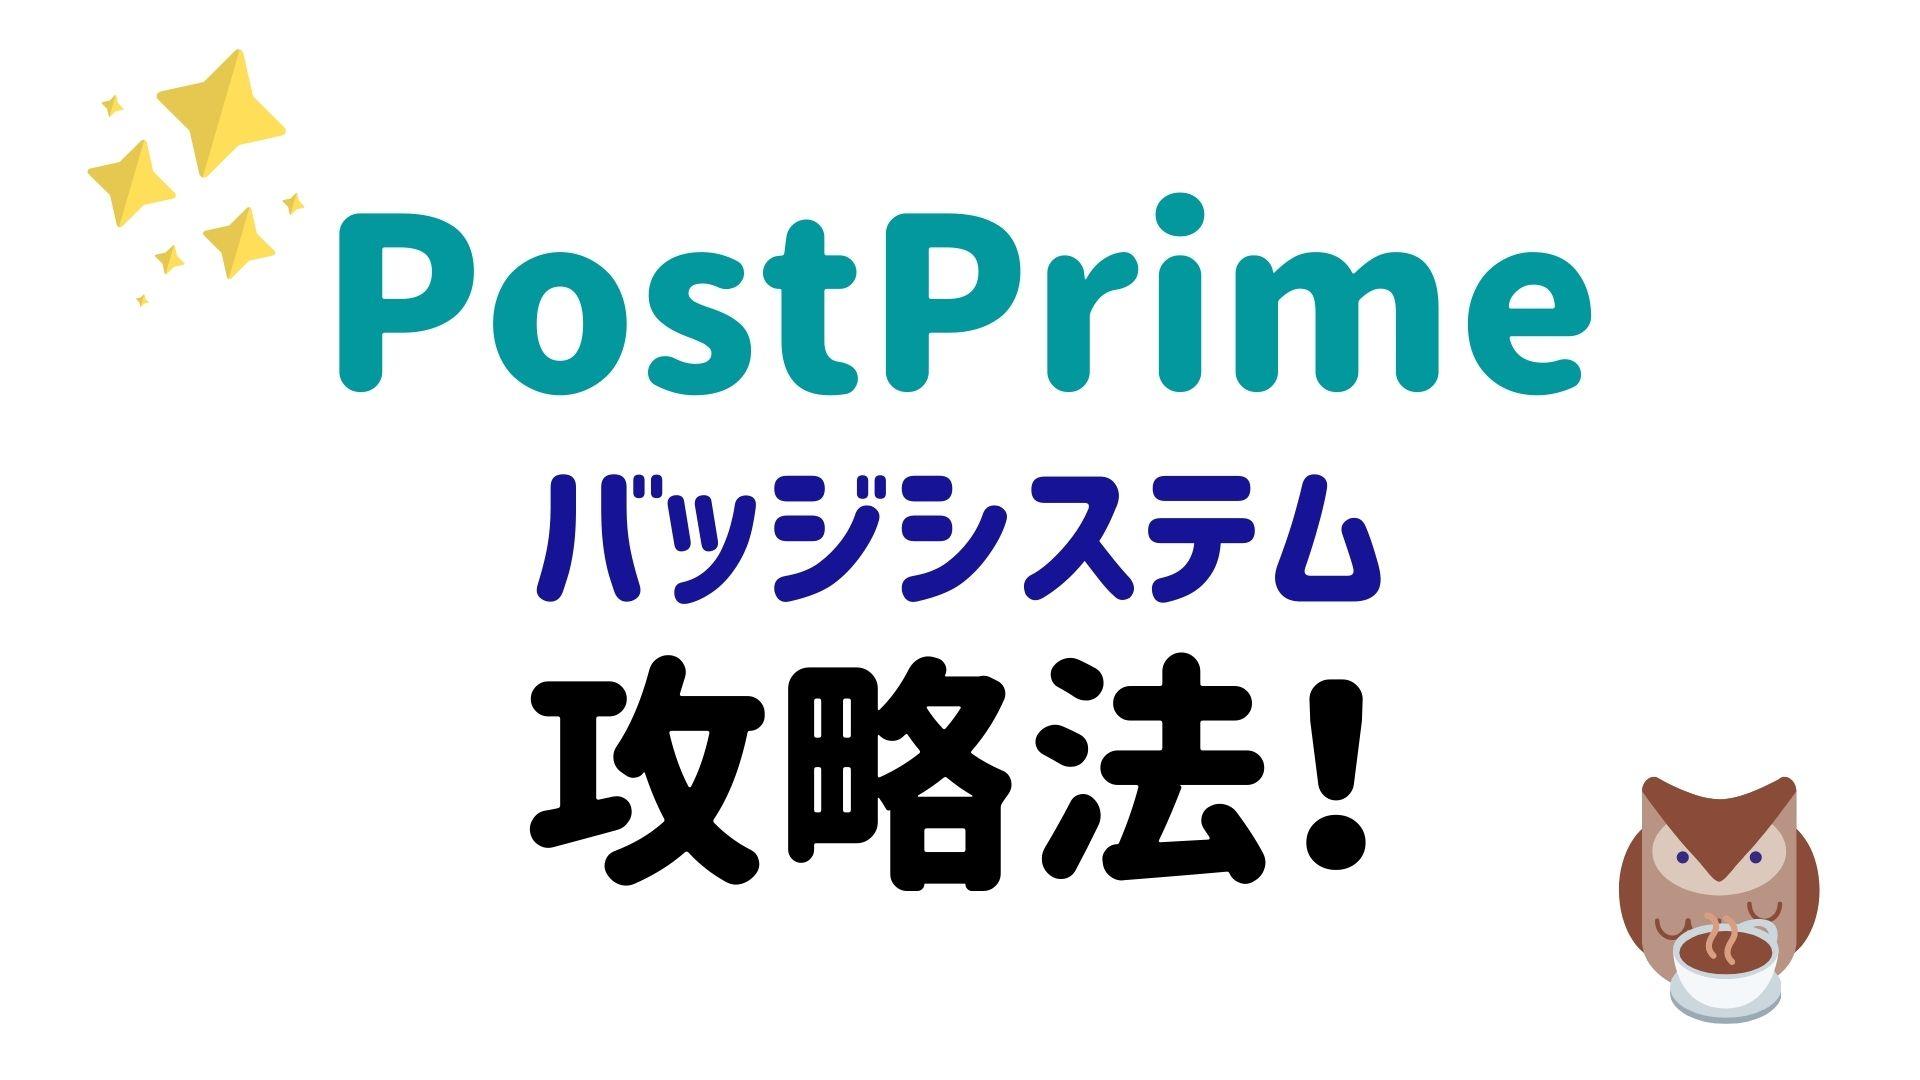 PostPrime バッジシステム 攻略法【レベルアップ】ポストプライムの使い方